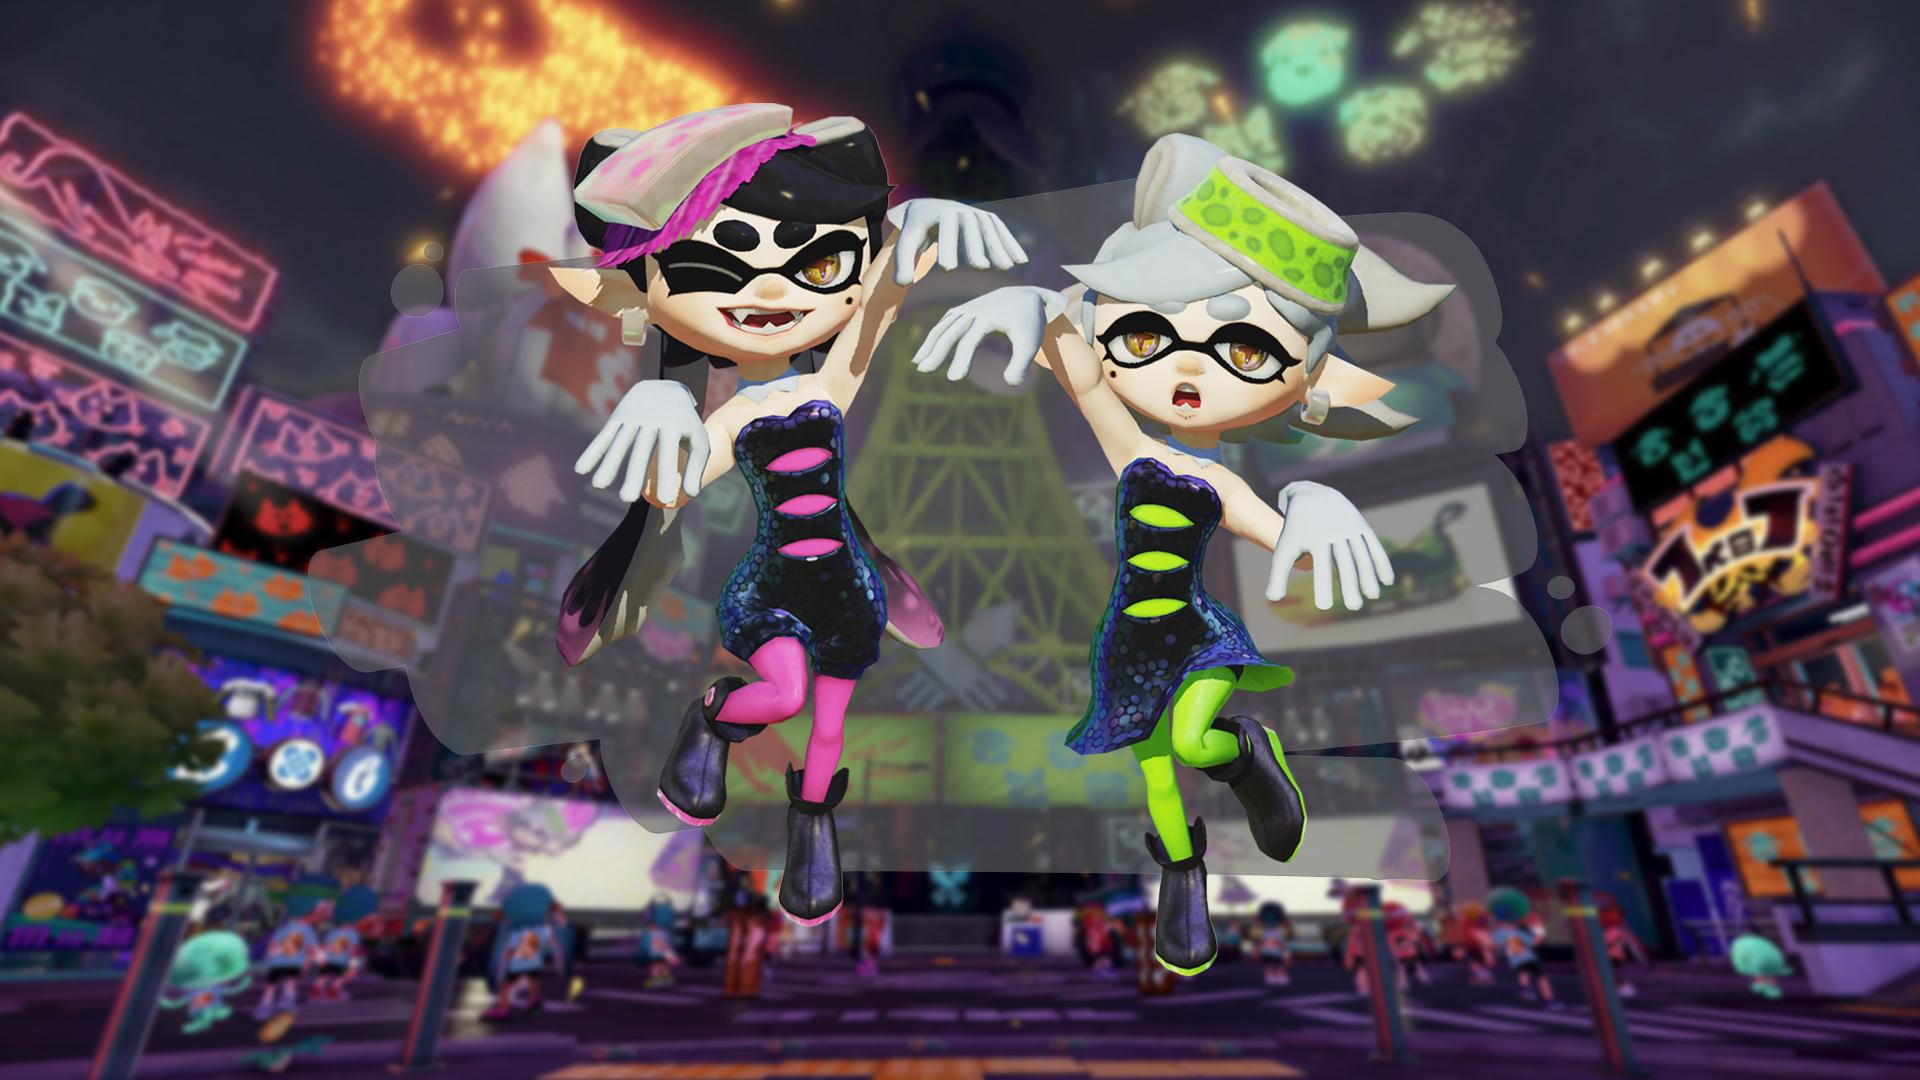 Splatoon 2 Squid Sisters Stories Chapter 6 Gonintendo